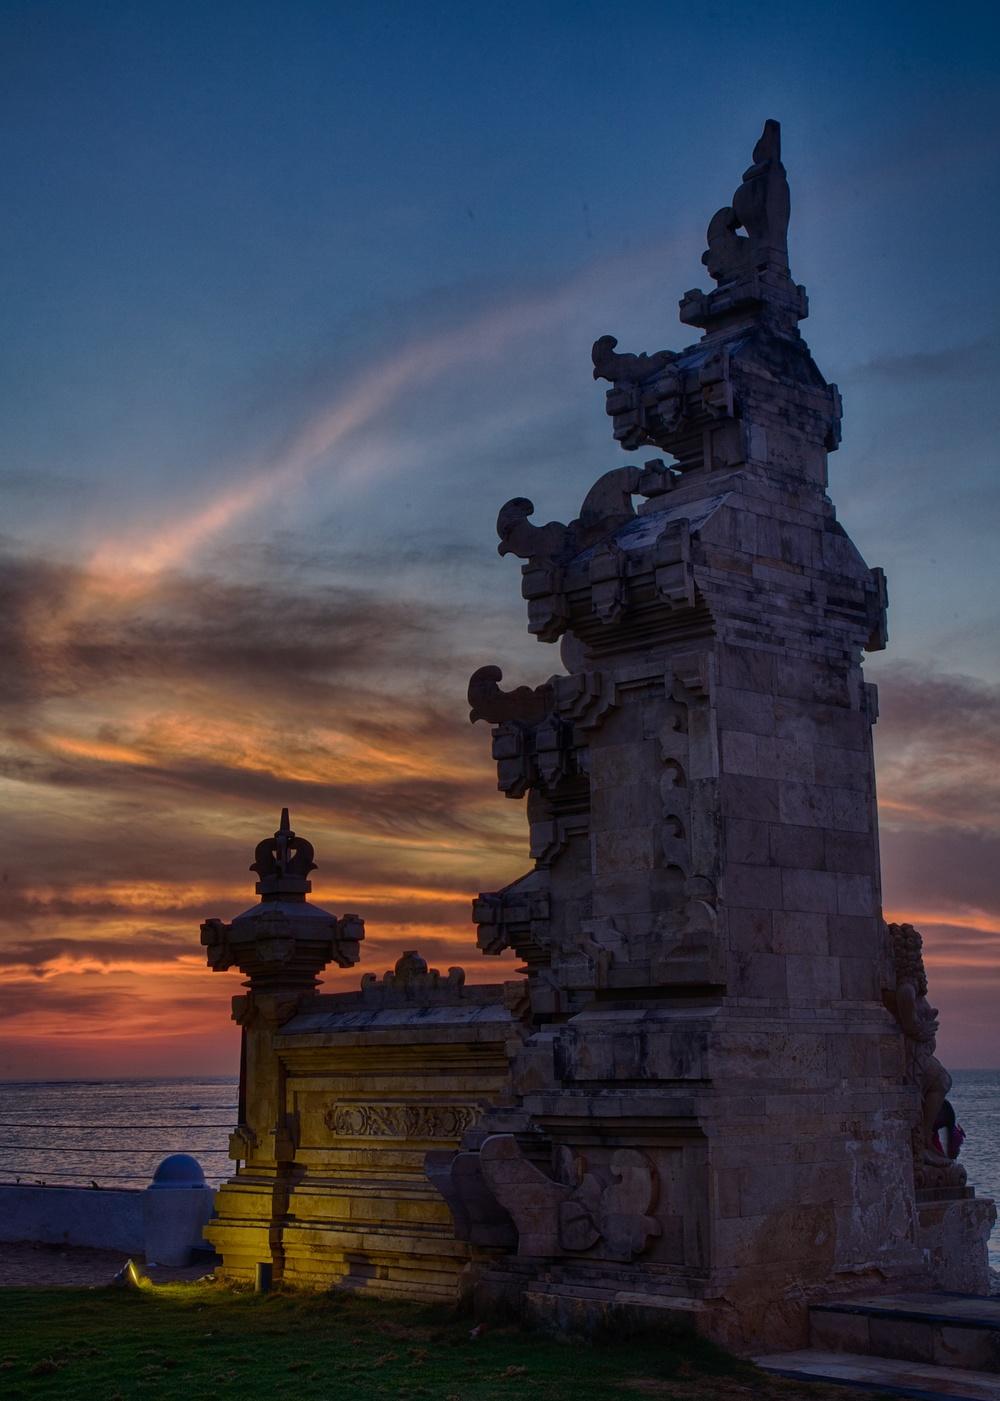 Bali  sunset HDR.jpg